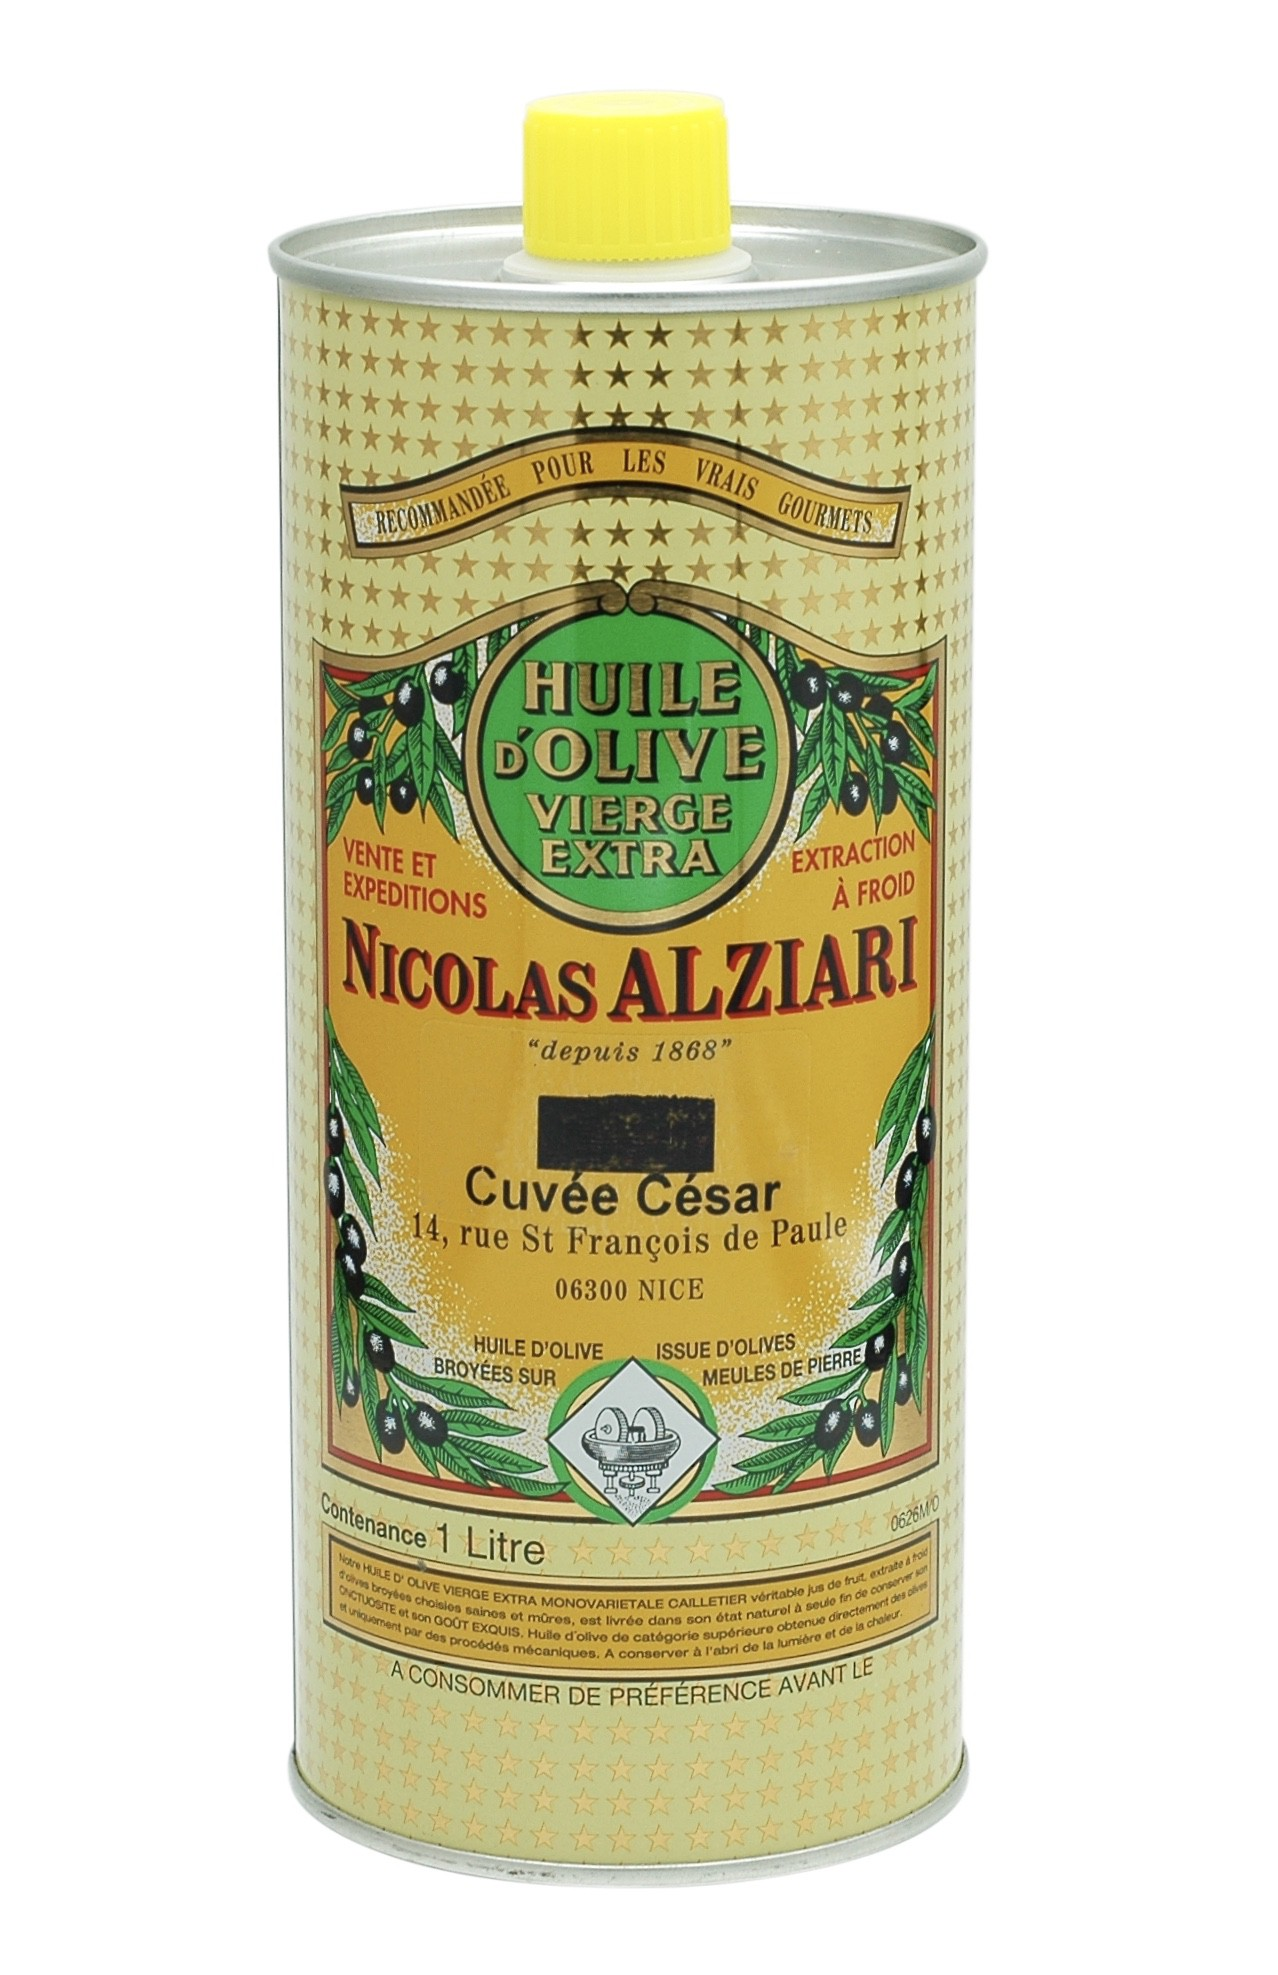 Huile d'olive Nicolas Alziari cuvée César 1 L (AOP Nice)